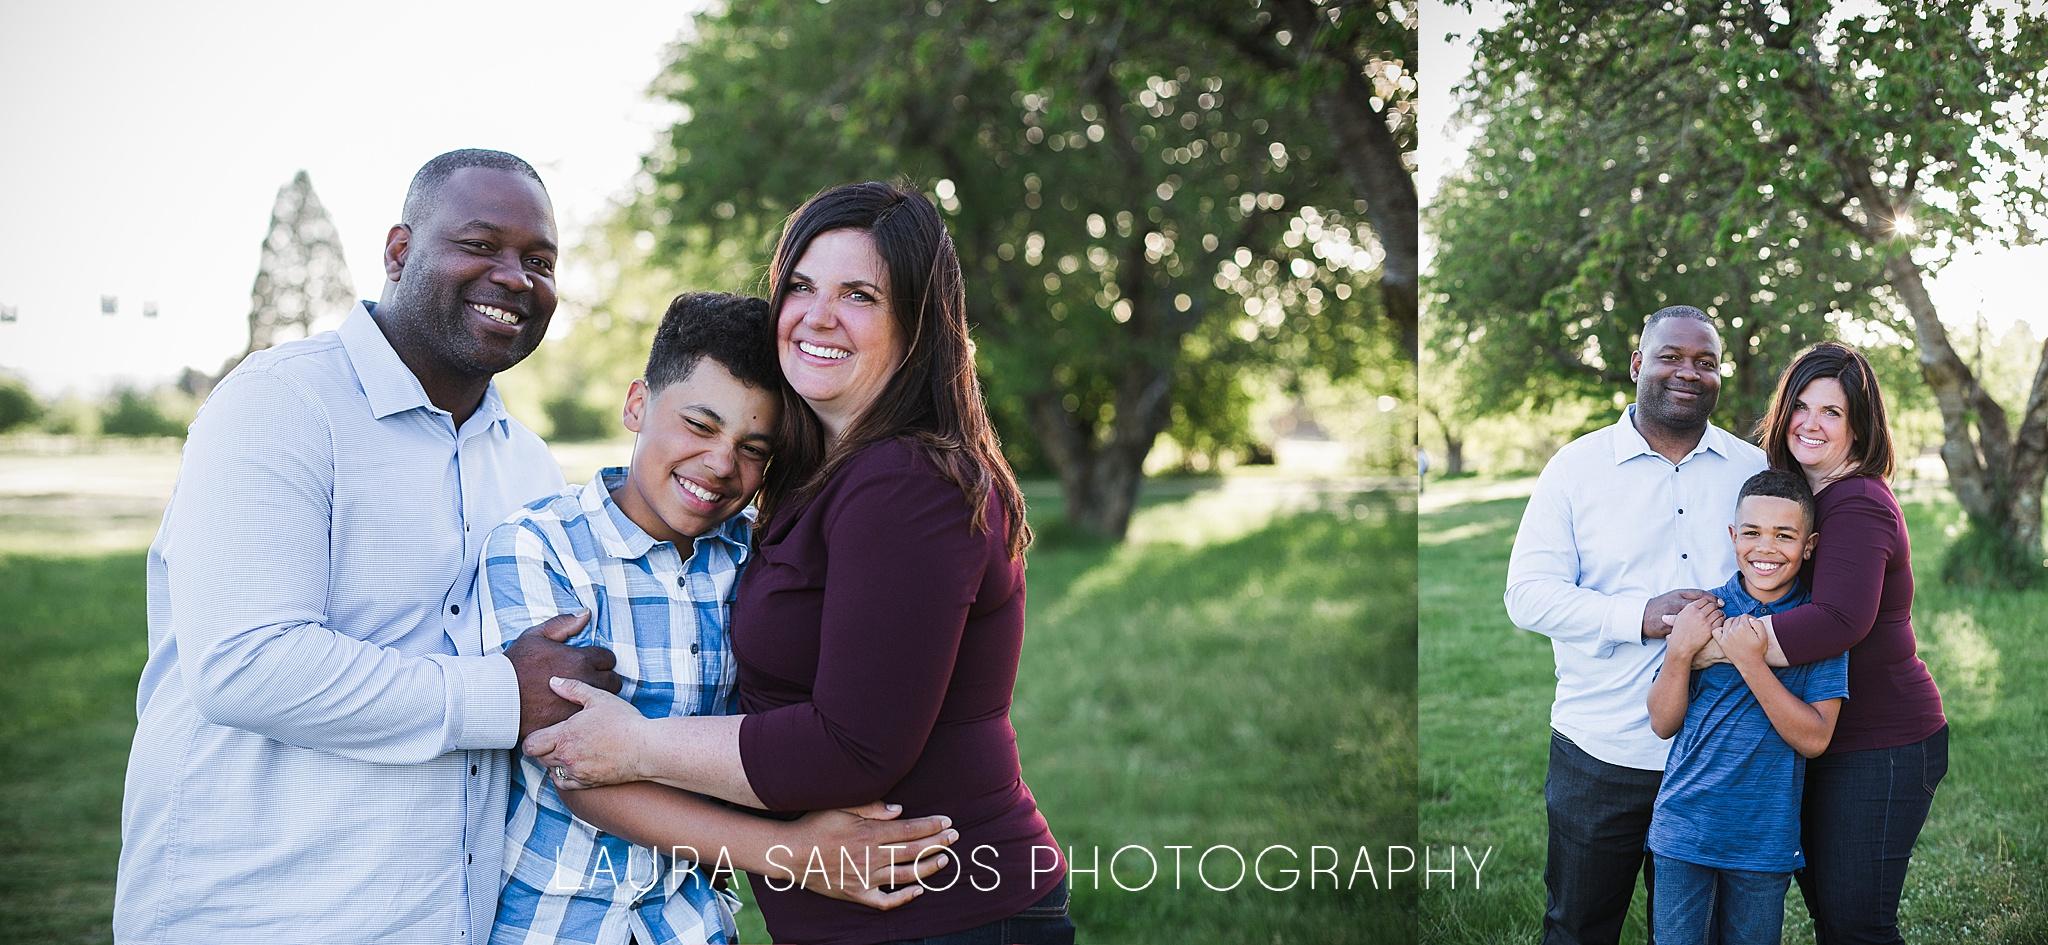 Laura Santos Photography Portland Oregon Family Photographer_0948.jpg